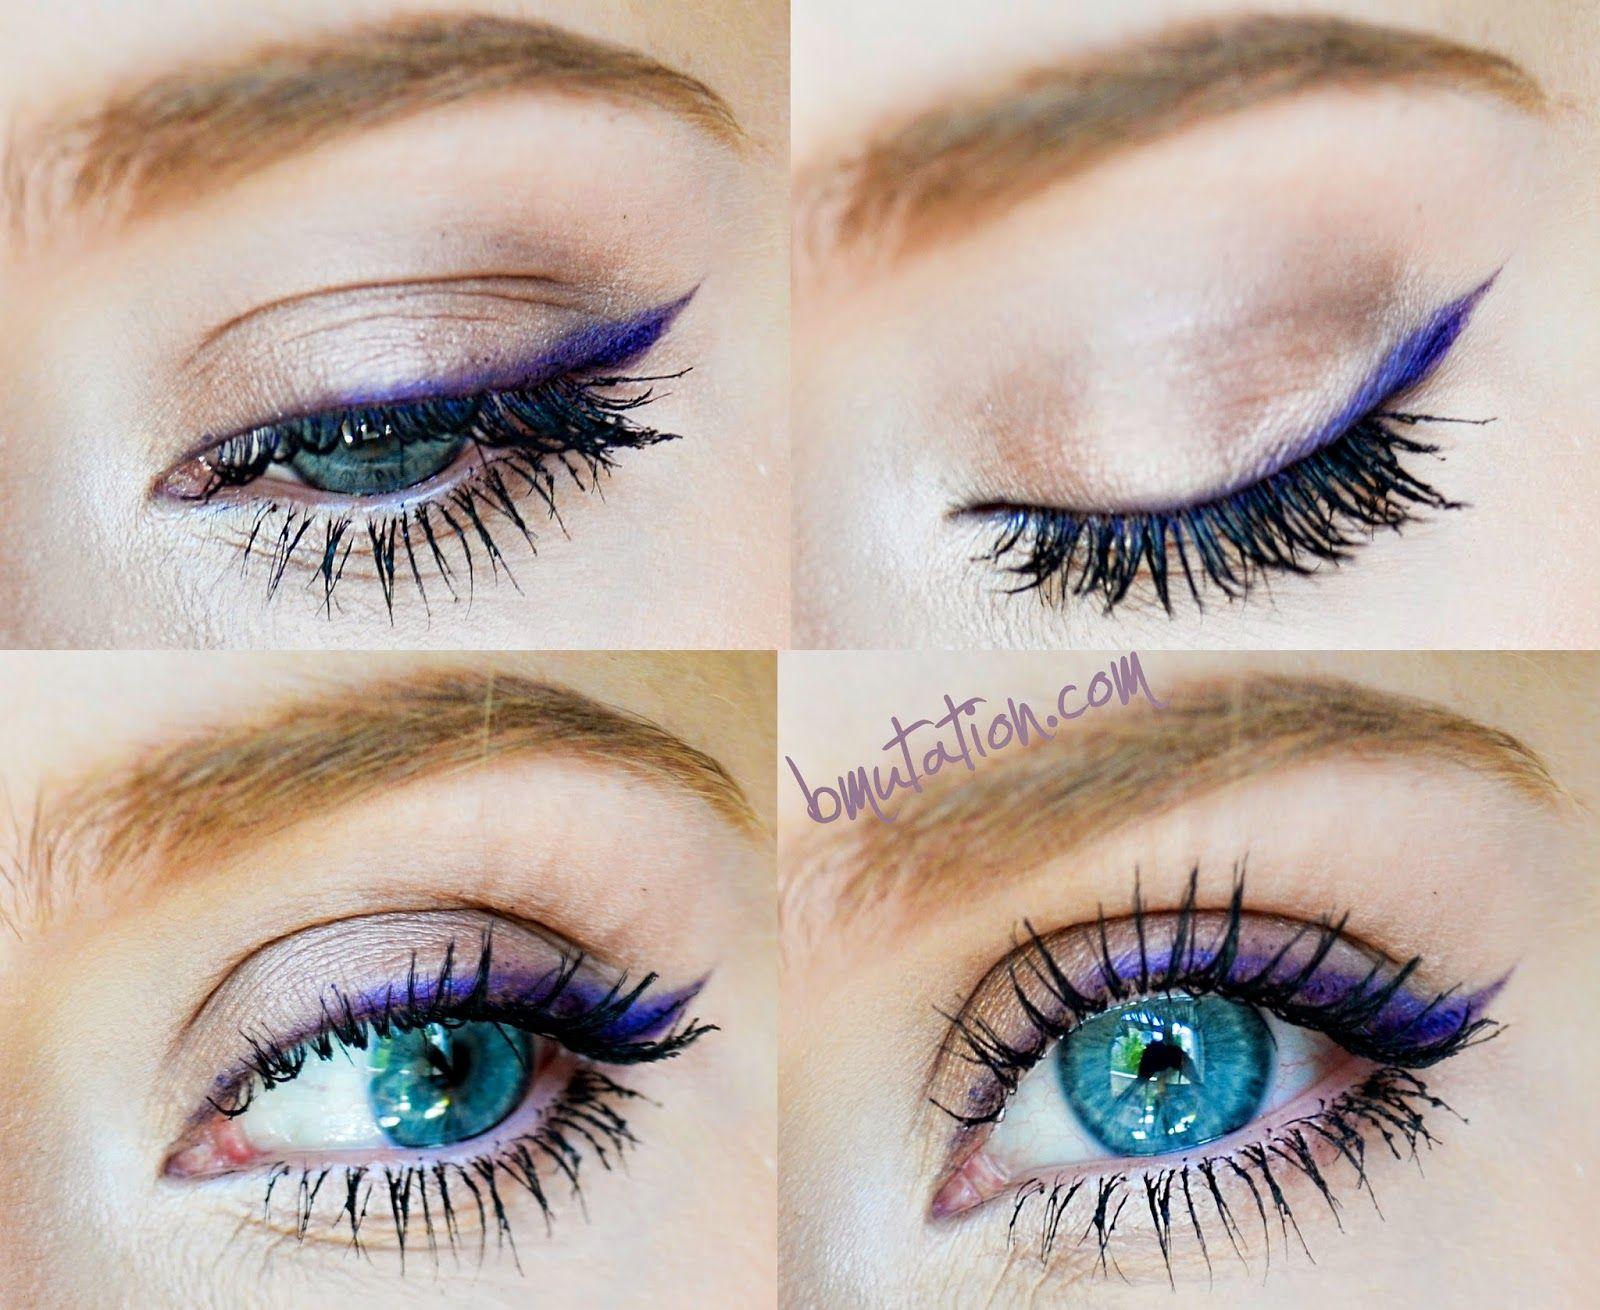 Simple and Chic (Barbie Mutation) | Dramatic eye makeup ...  Violet Eyes Mutation